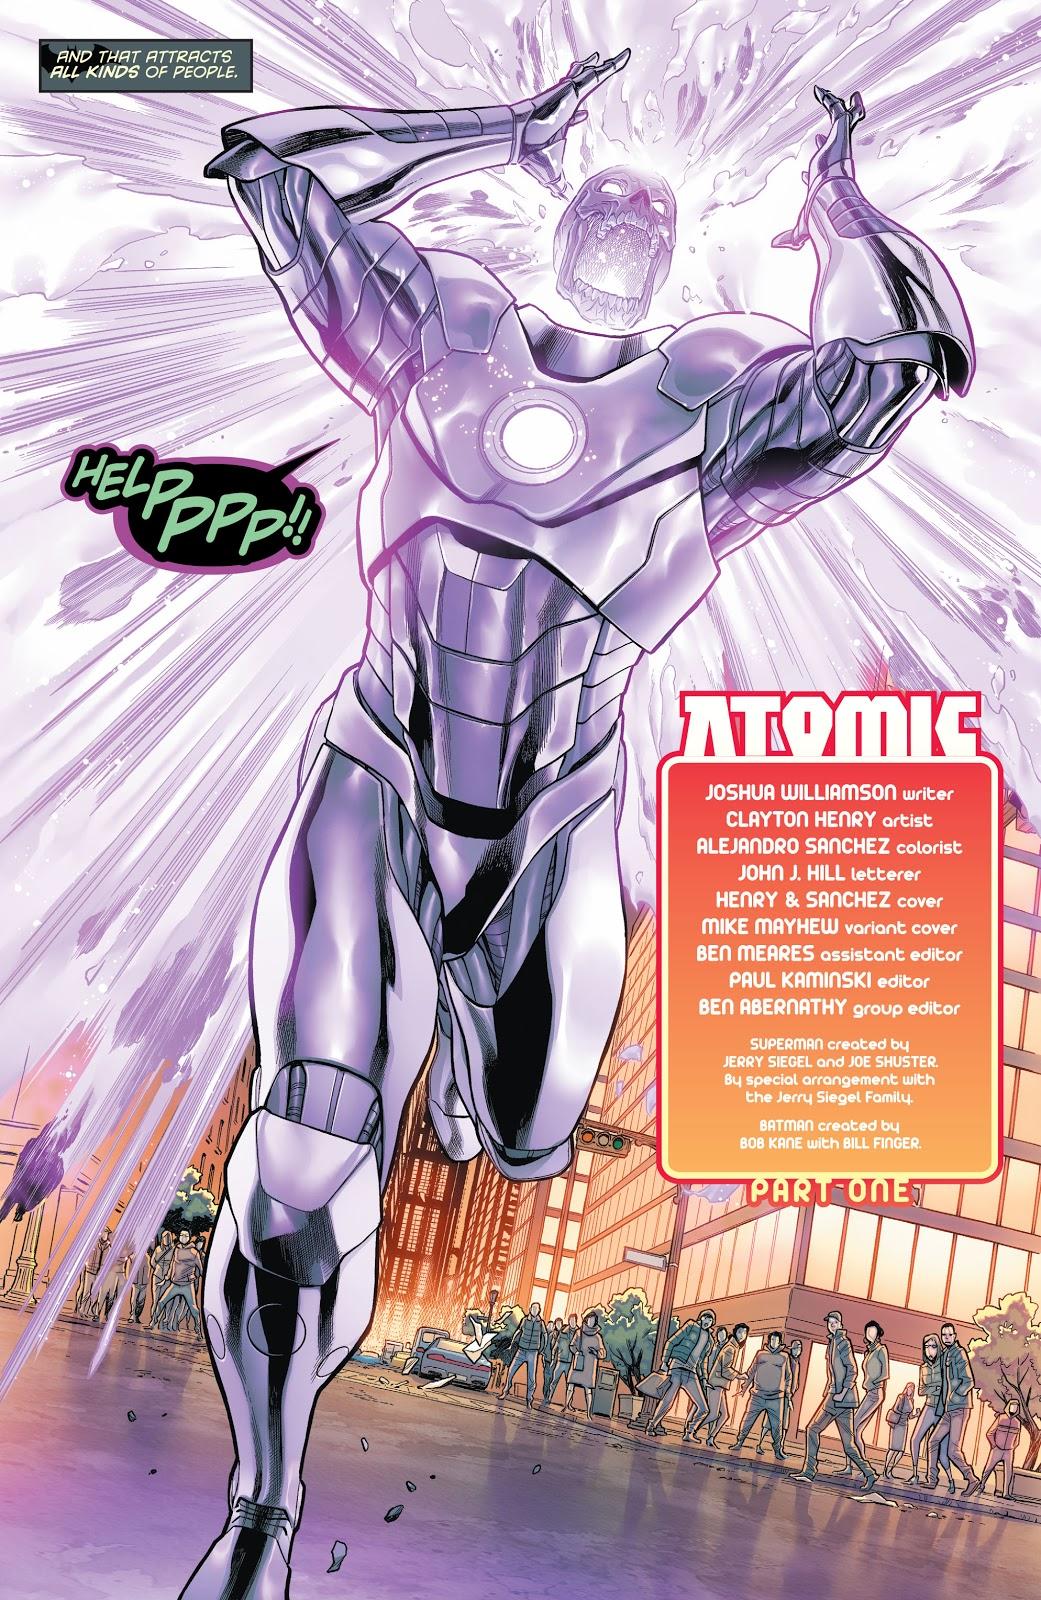 Atomic Skull (Batman Superman Vol. 2 #9)